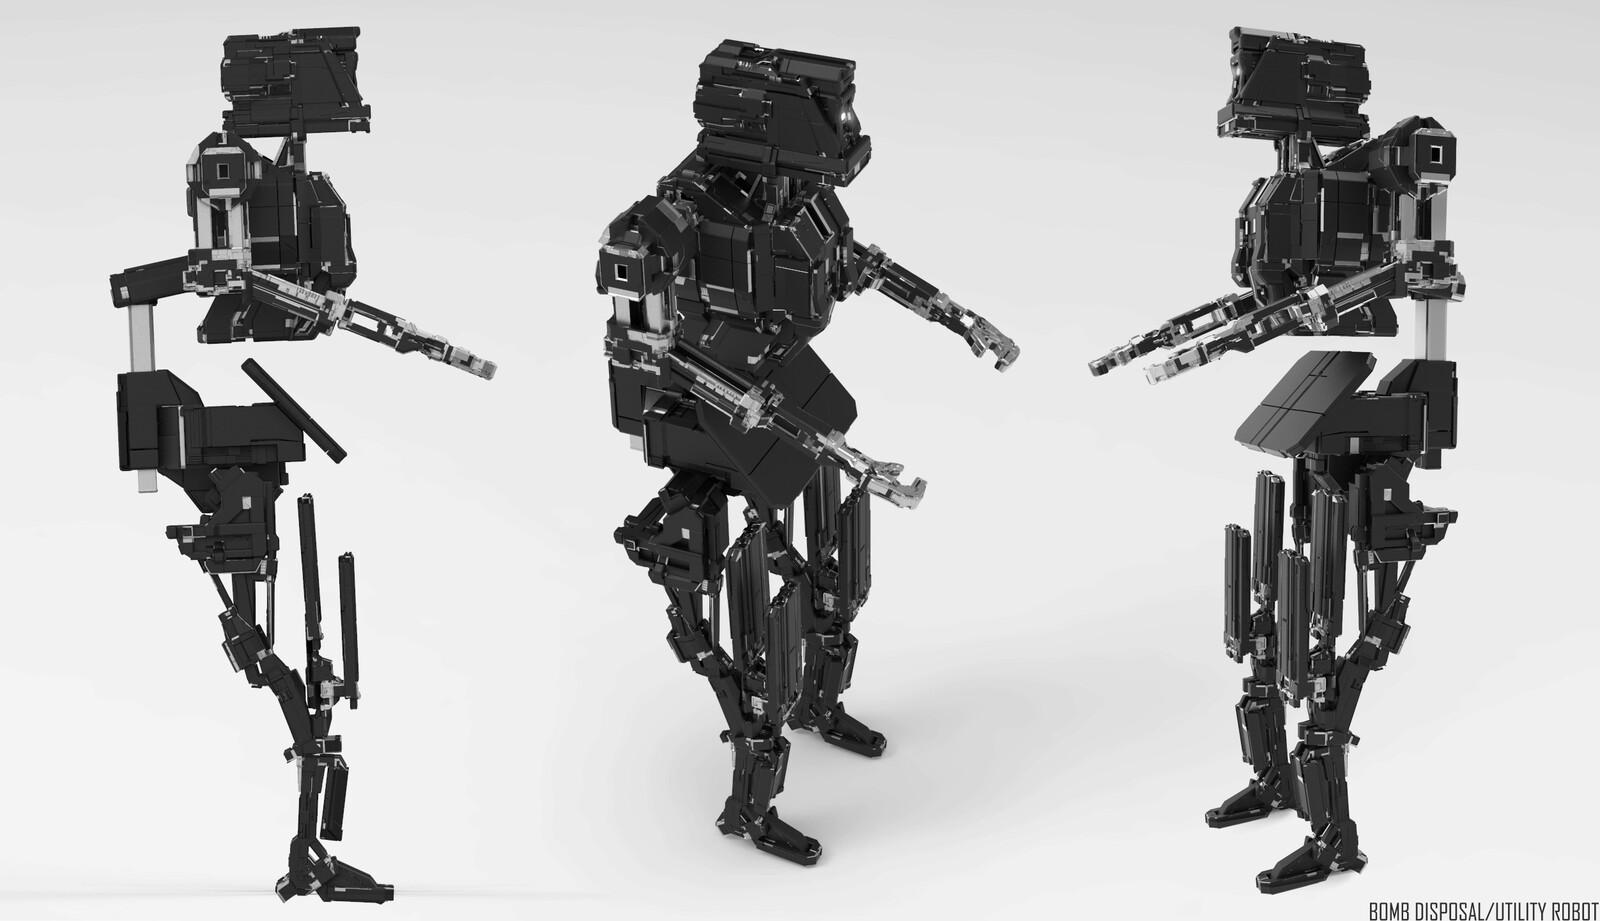 Bomb disposal/utility robot